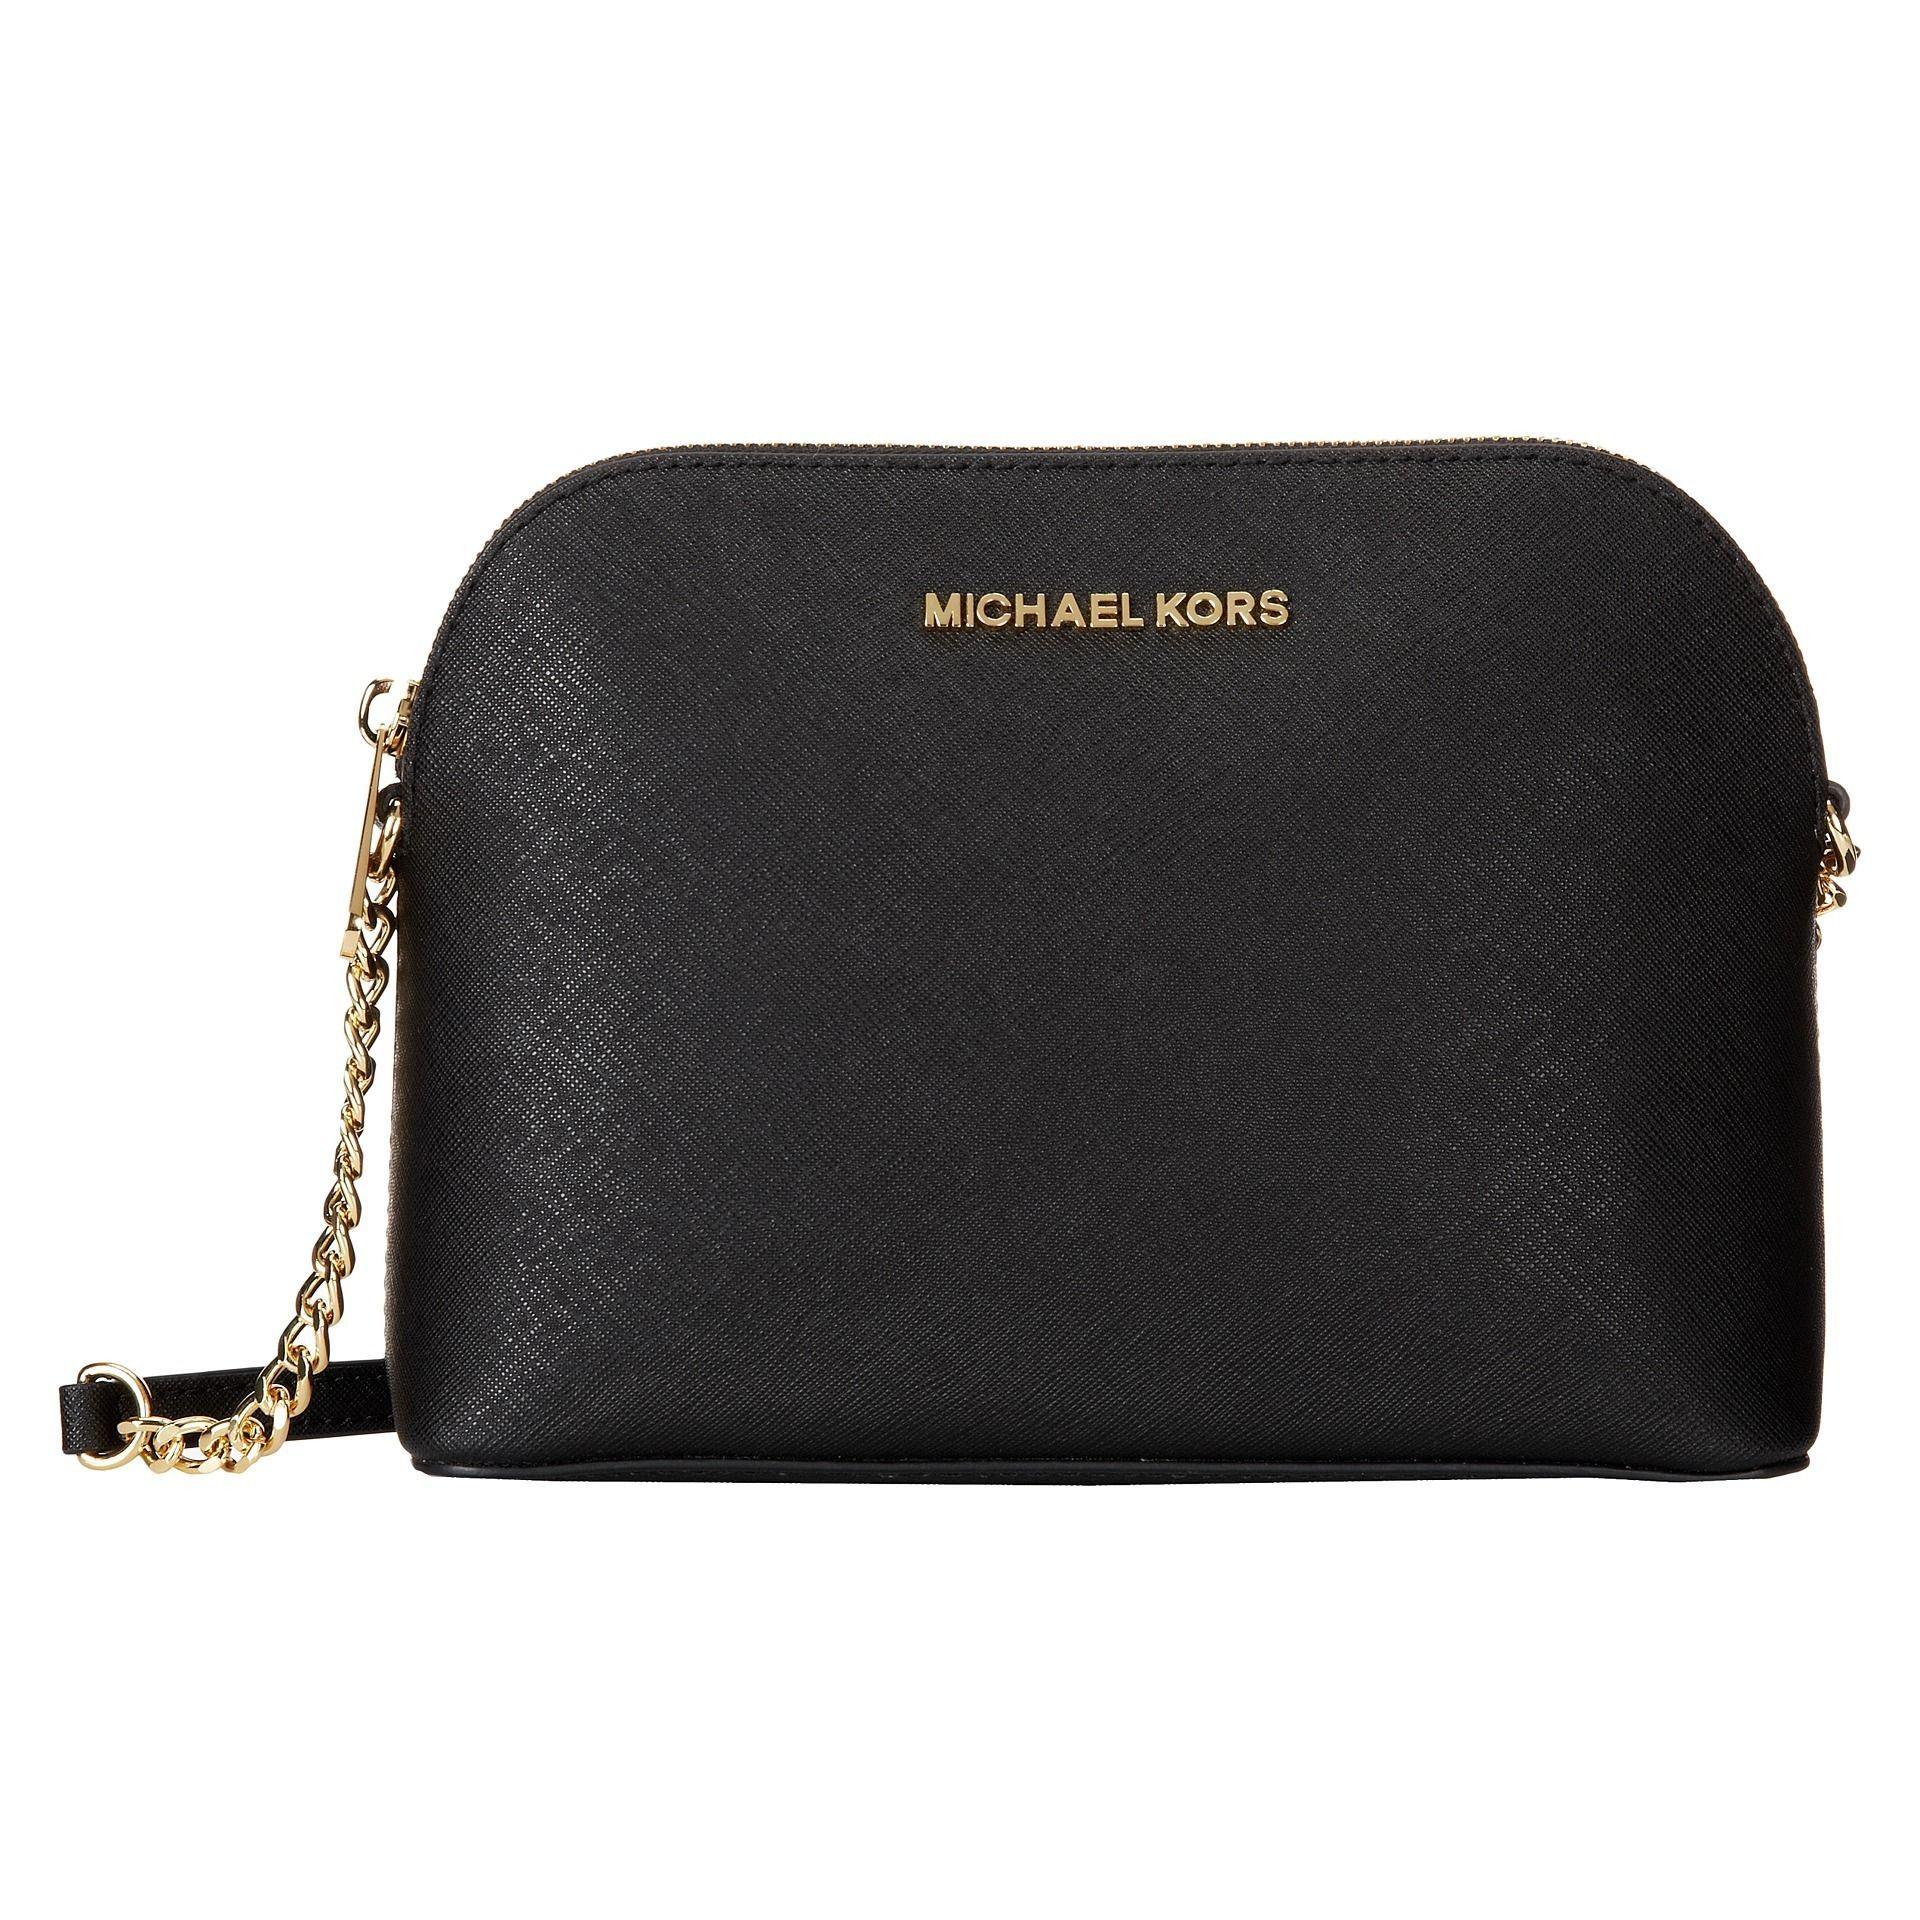 4645c1e4d94a6e Michael Michael Kors Cindy / Gold Saffiano Dome Handbag Handbags Michael  Kors, Purses And Handbags